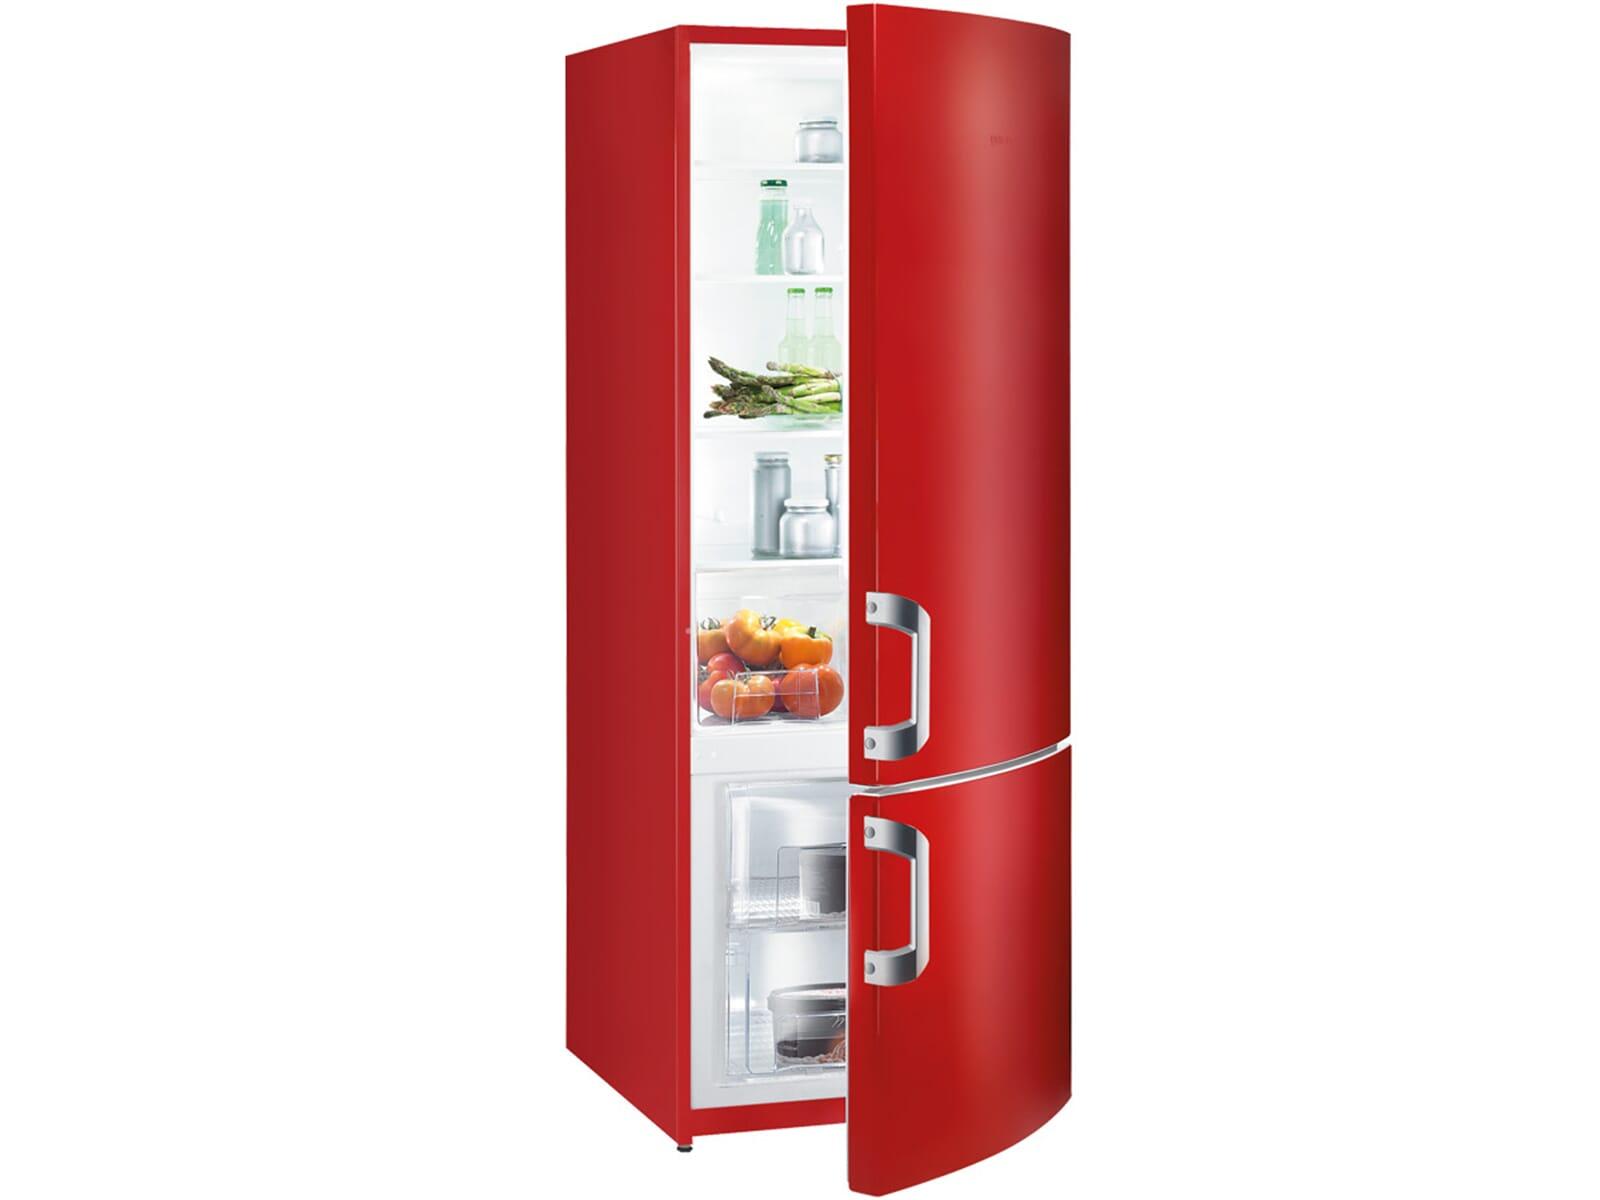 Gorenje Kühlschrank Nrk 193 : Gorenje kühlschrank gefrierkombination gorenje rk or l